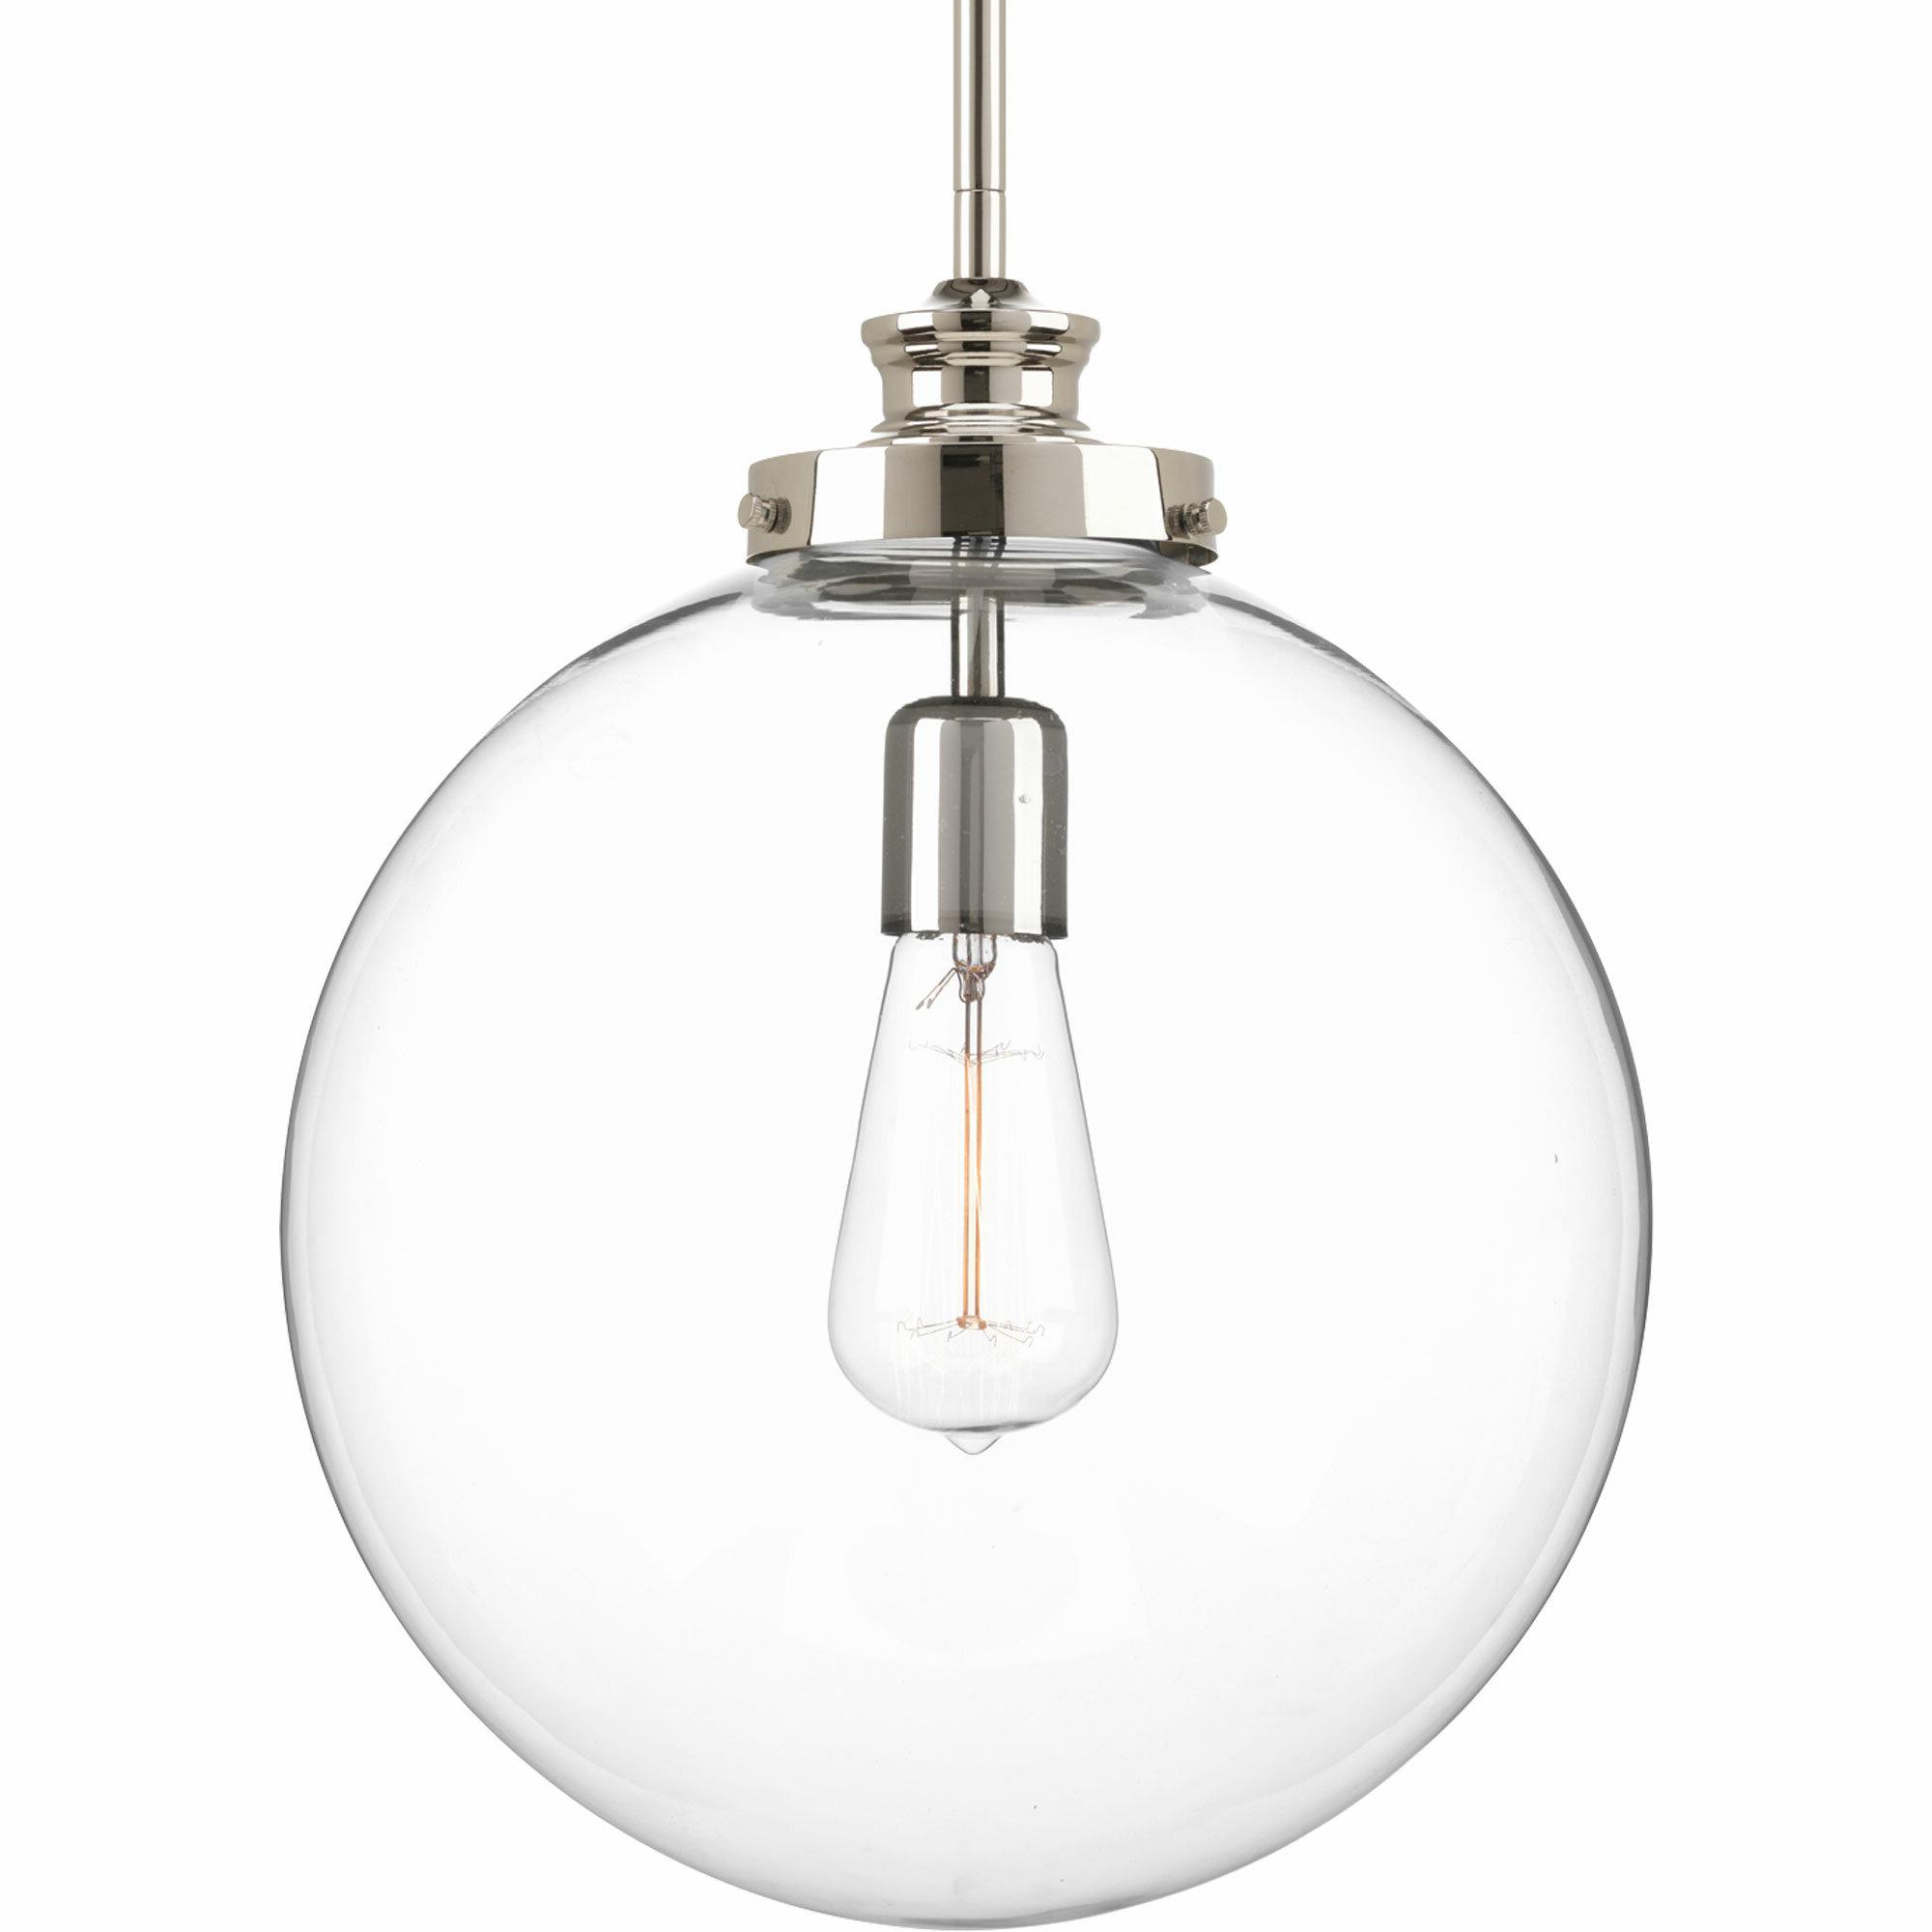 Cayden 1 Light Single Globe Pendant Pertaining To Widely Used 1 Light Geometric Globe Pendants (View 12 of 25)